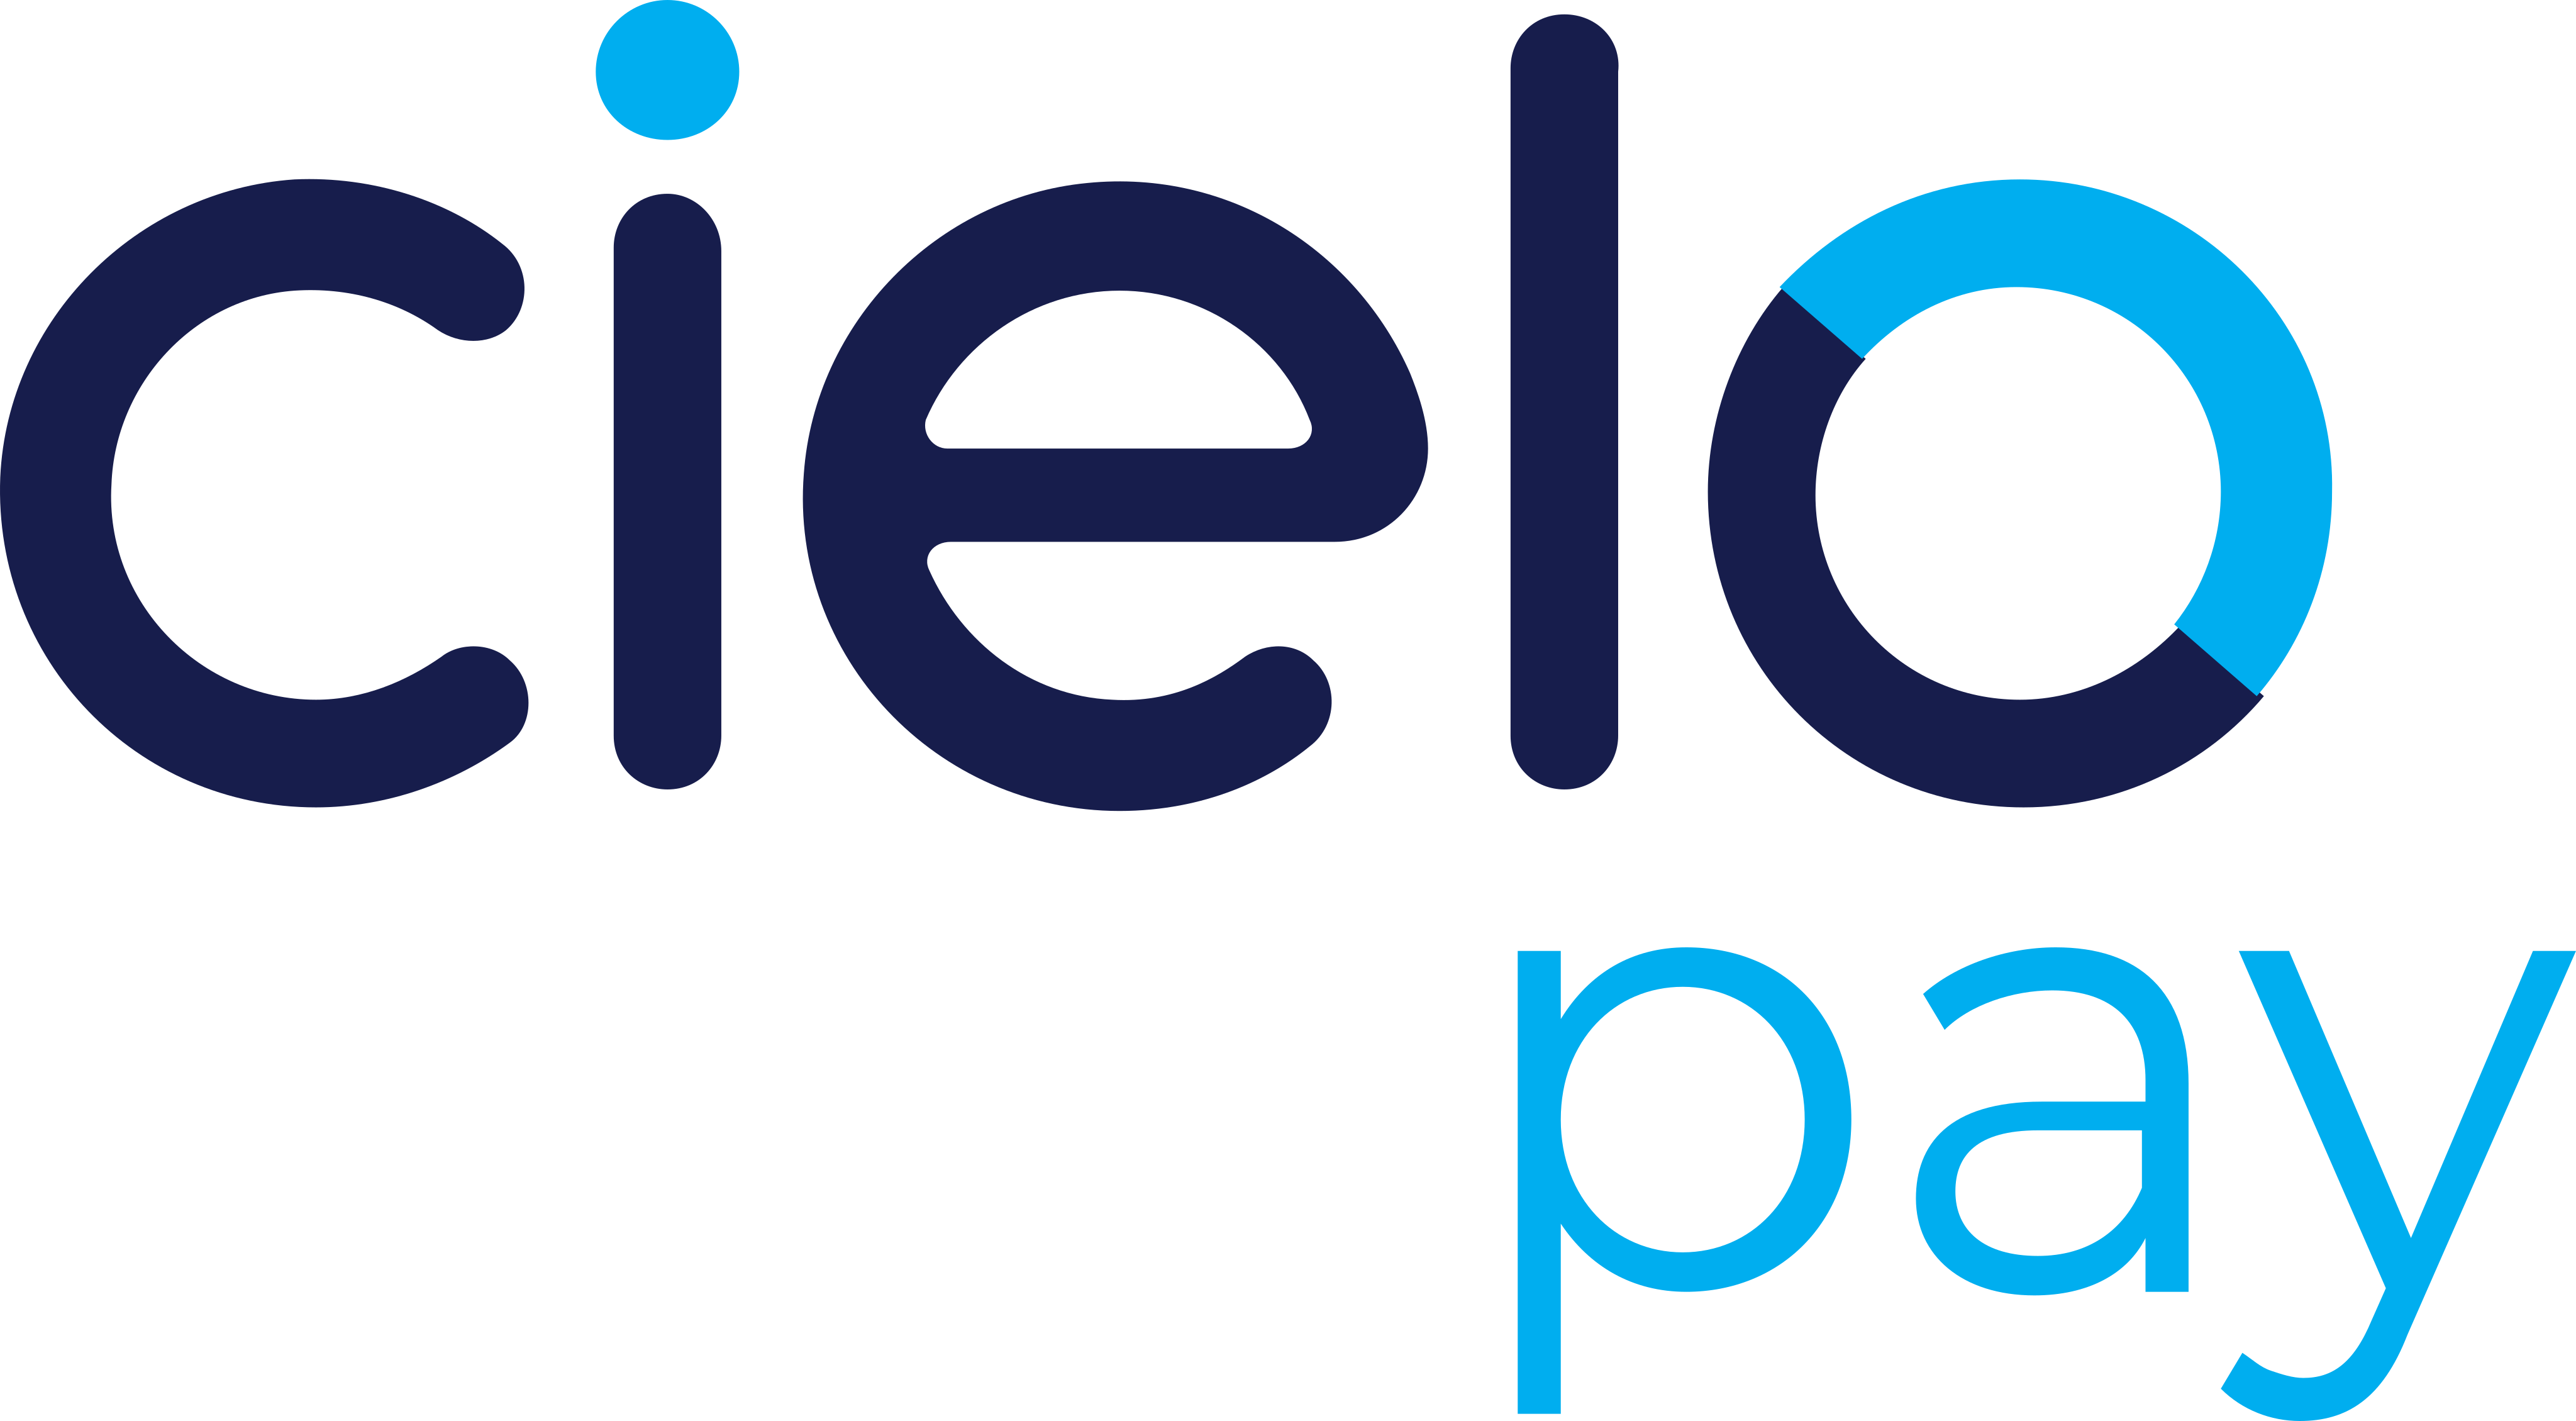 Cielo Pay Logo.